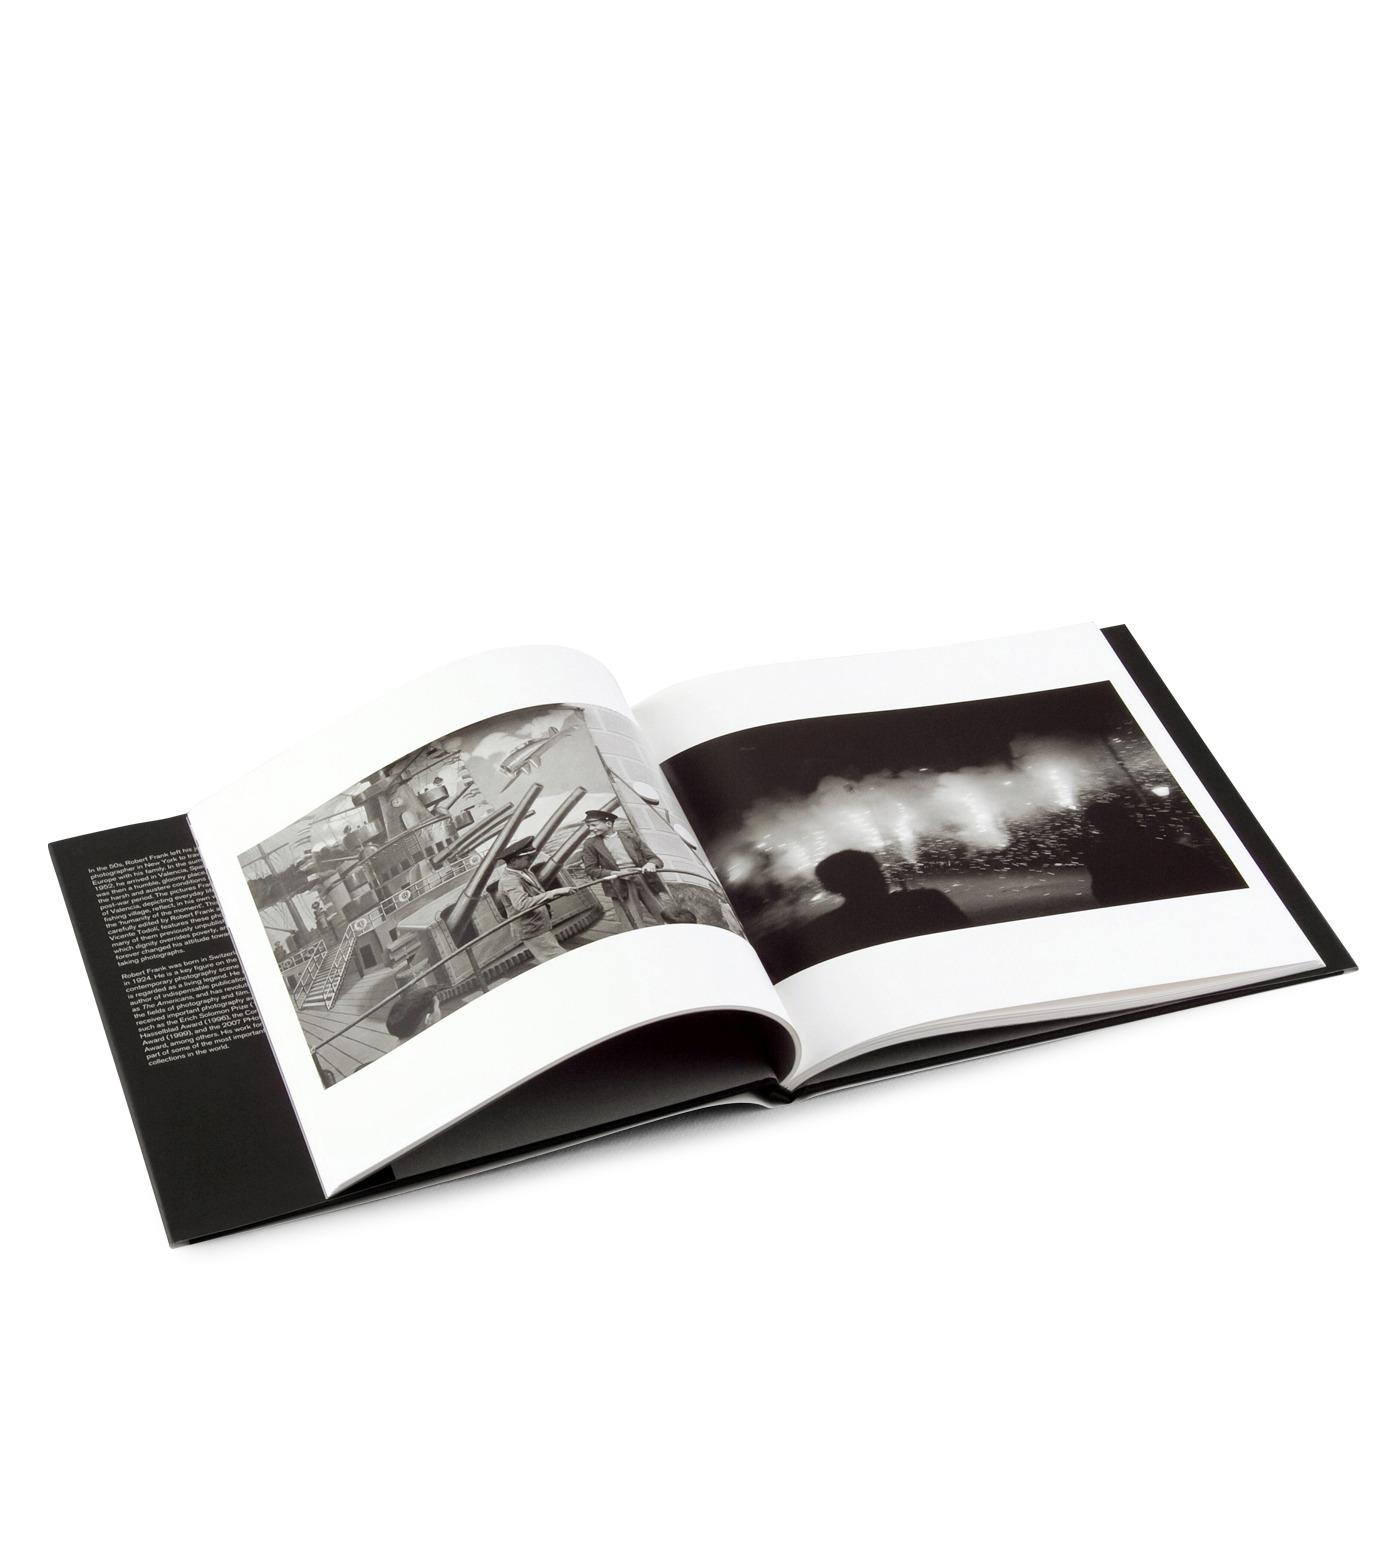 ArtBook(アートブック)のRobert Frank: Valencia 1952.-NONE(インテリア/OTHER-GOODS/interior/OTHER-GOODS)-86930-502-8-0 拡大詳細画像3